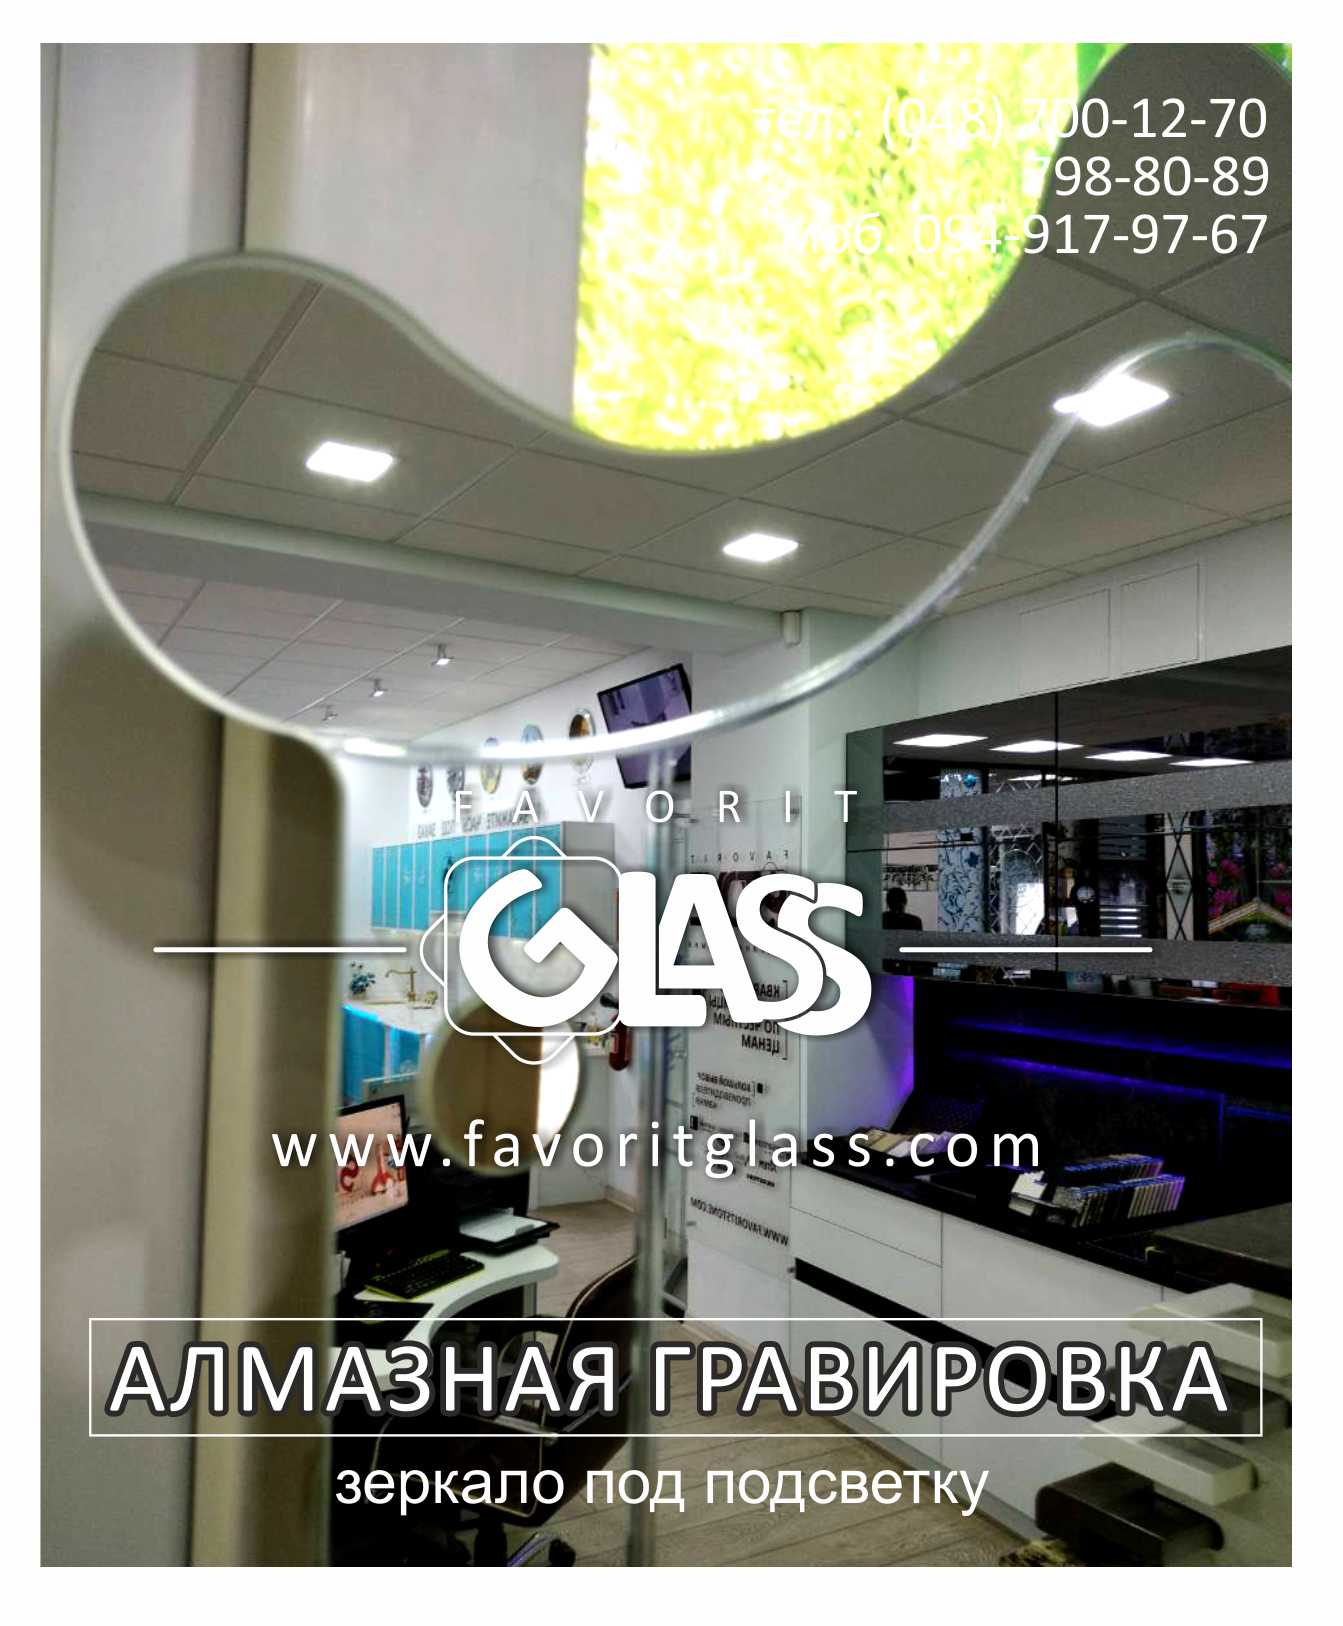 Алмазная гравировка # зеркало# новинка #